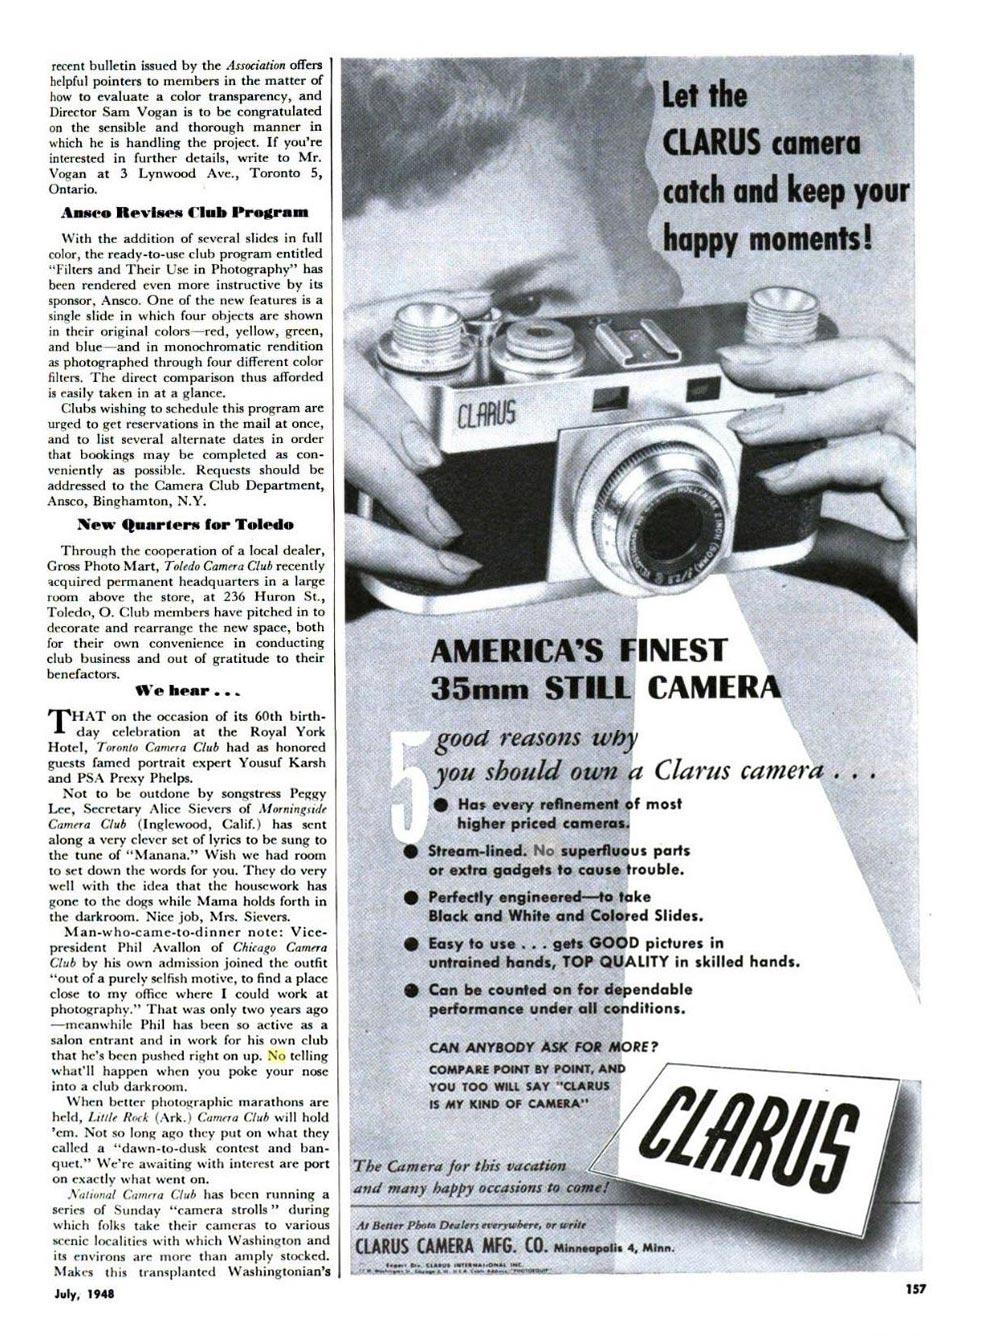 Clarus Model MS-35